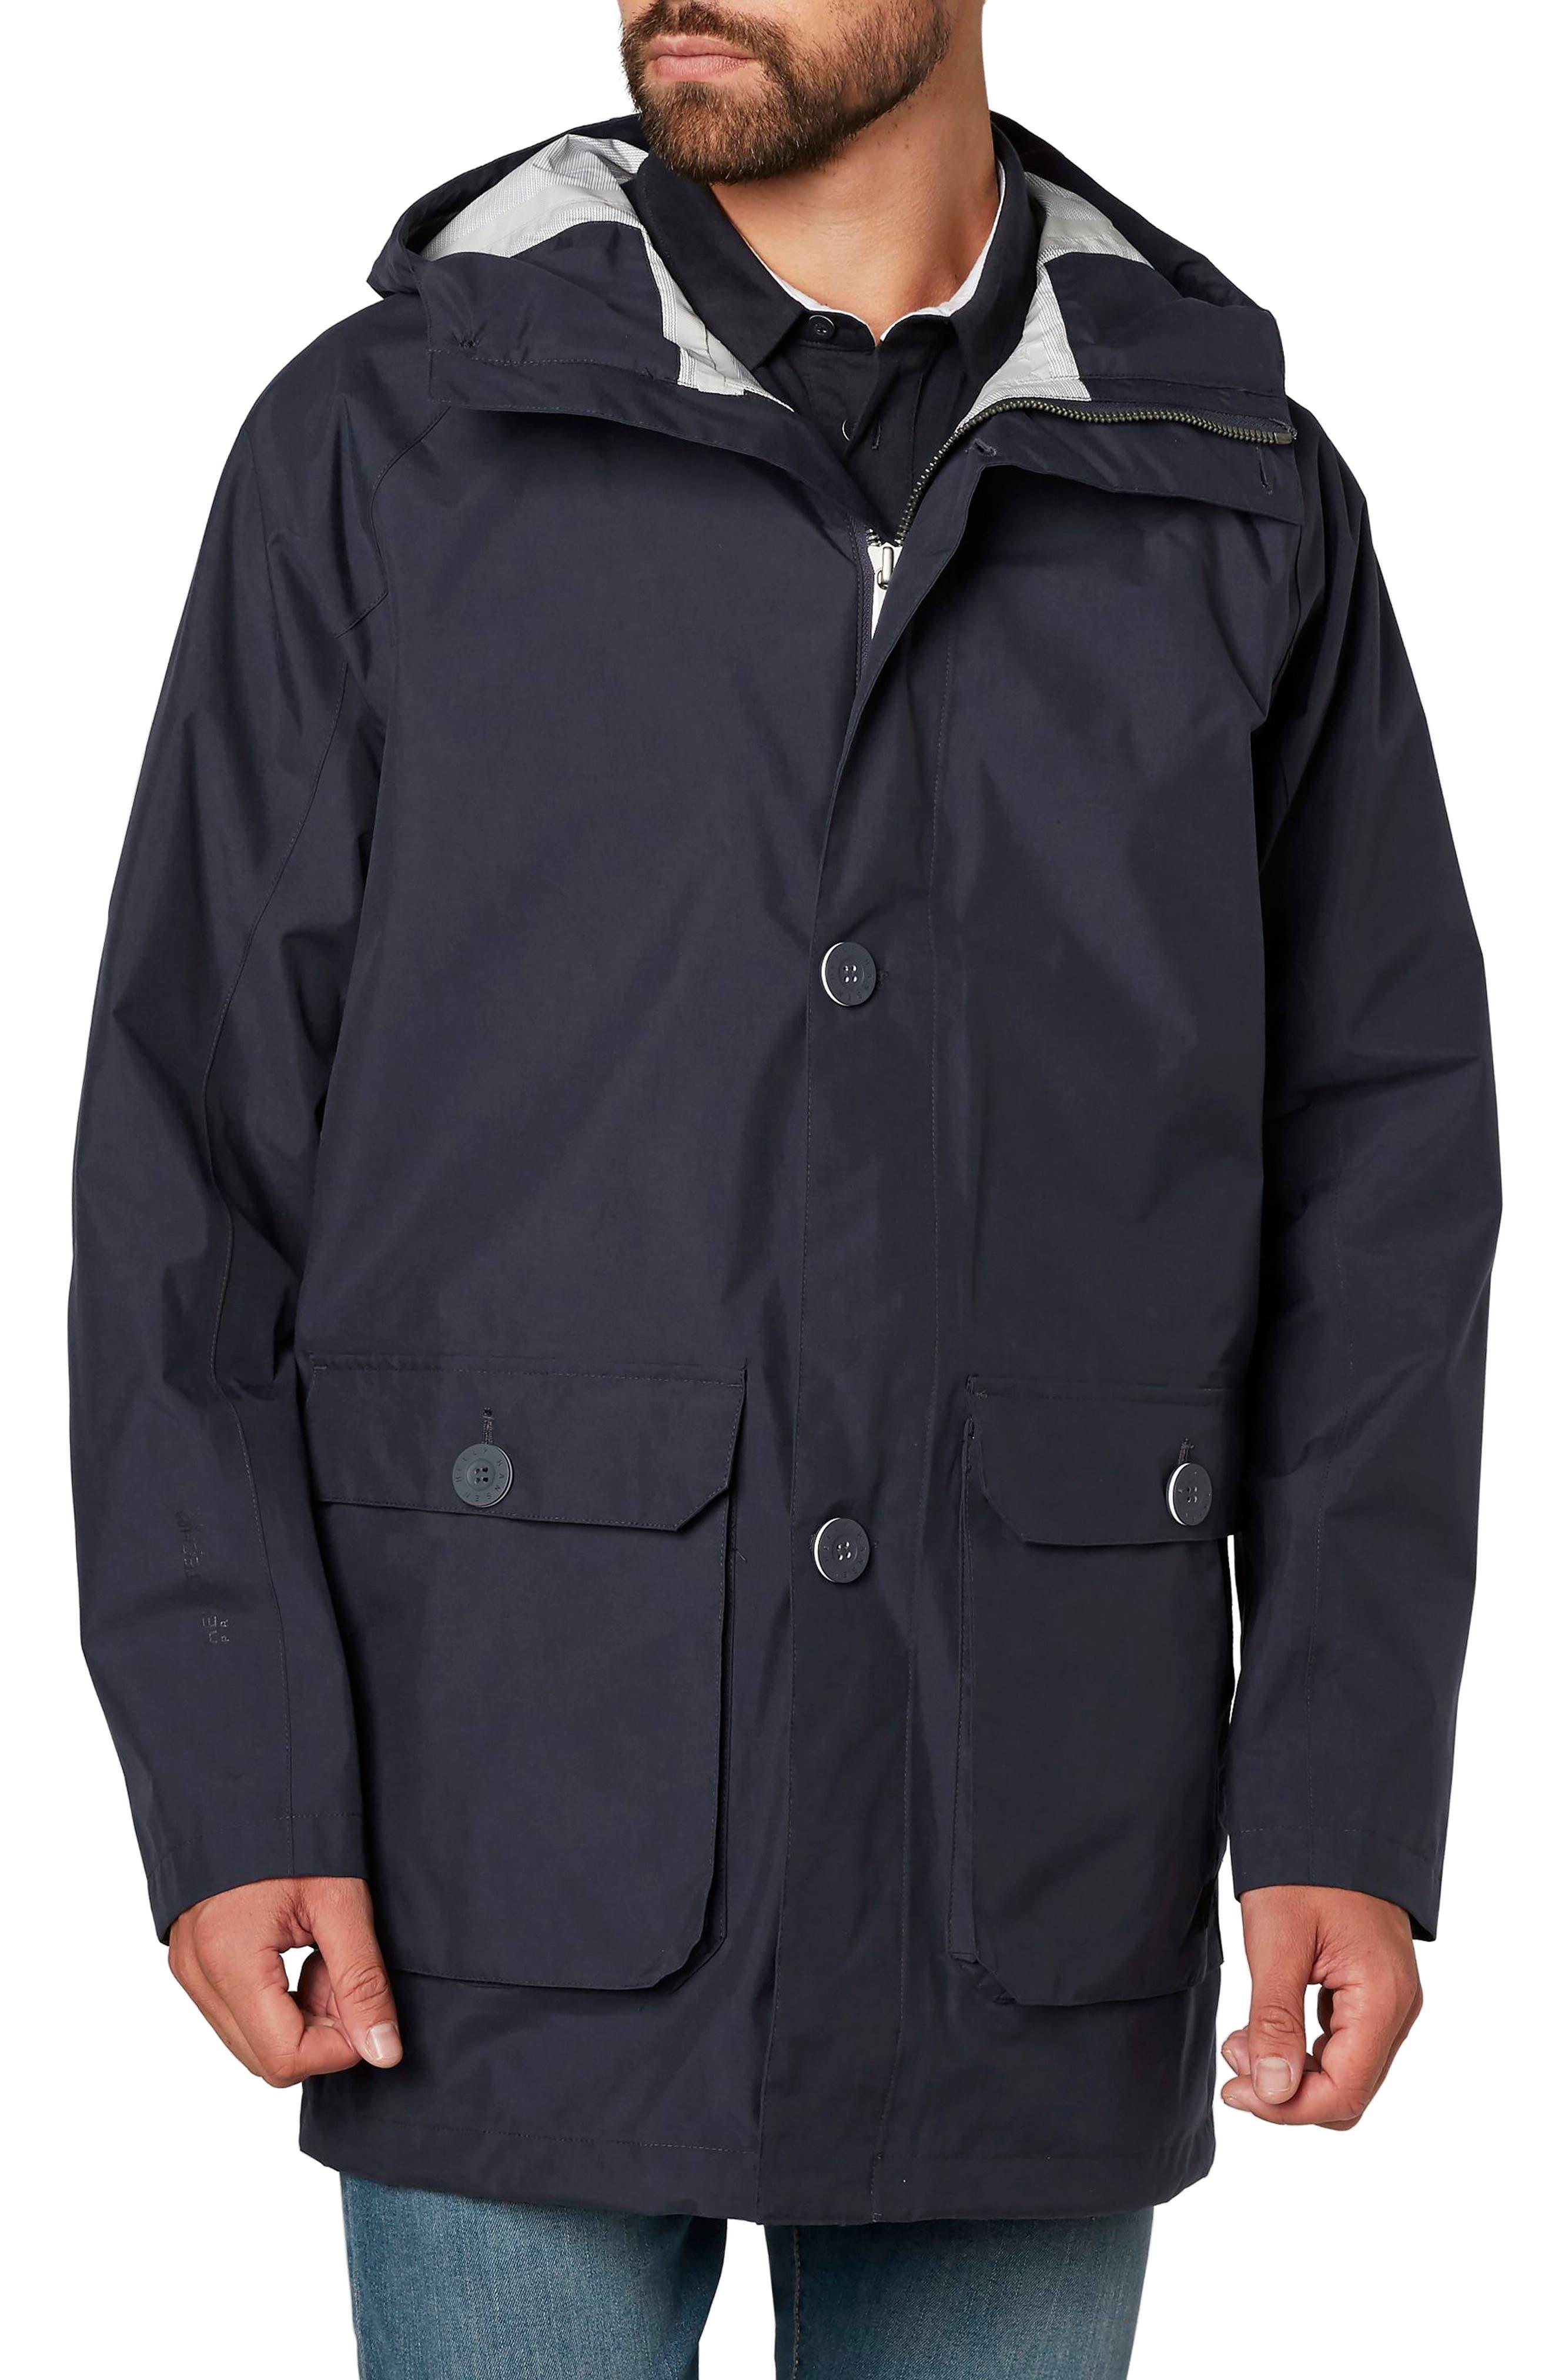 Elements Hooded Rain Jacket,                         Main,                         color, Graphite Blue